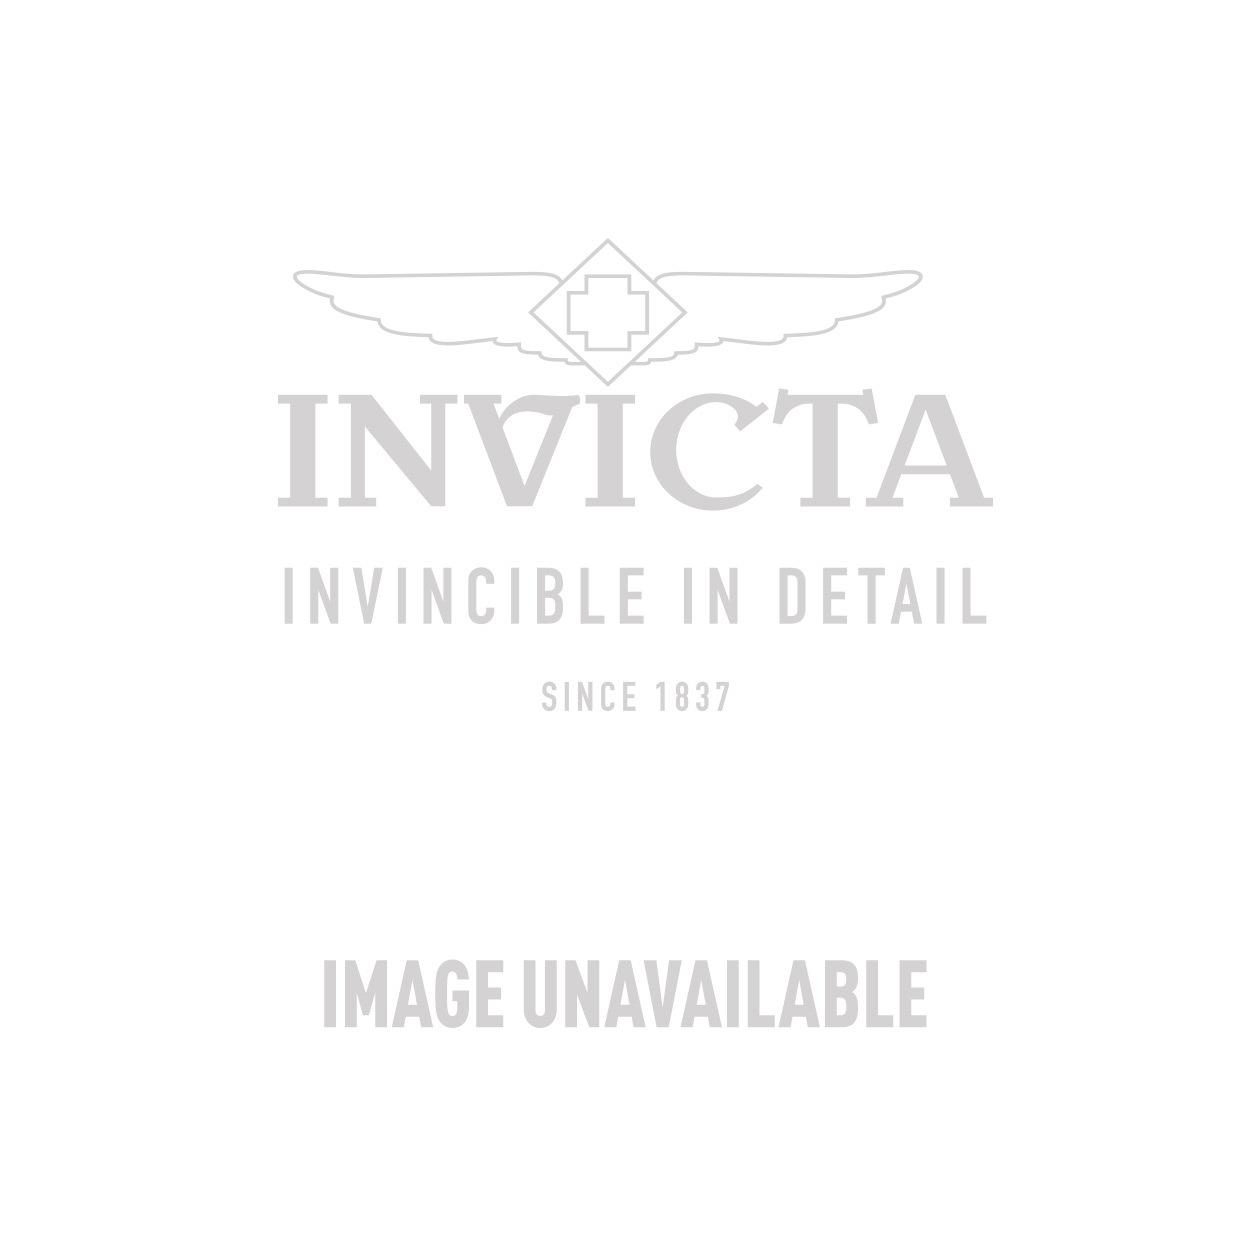 Invicta Speedway Quartz Watch - Stainless Steel case Stainless Steel band - Model 18391